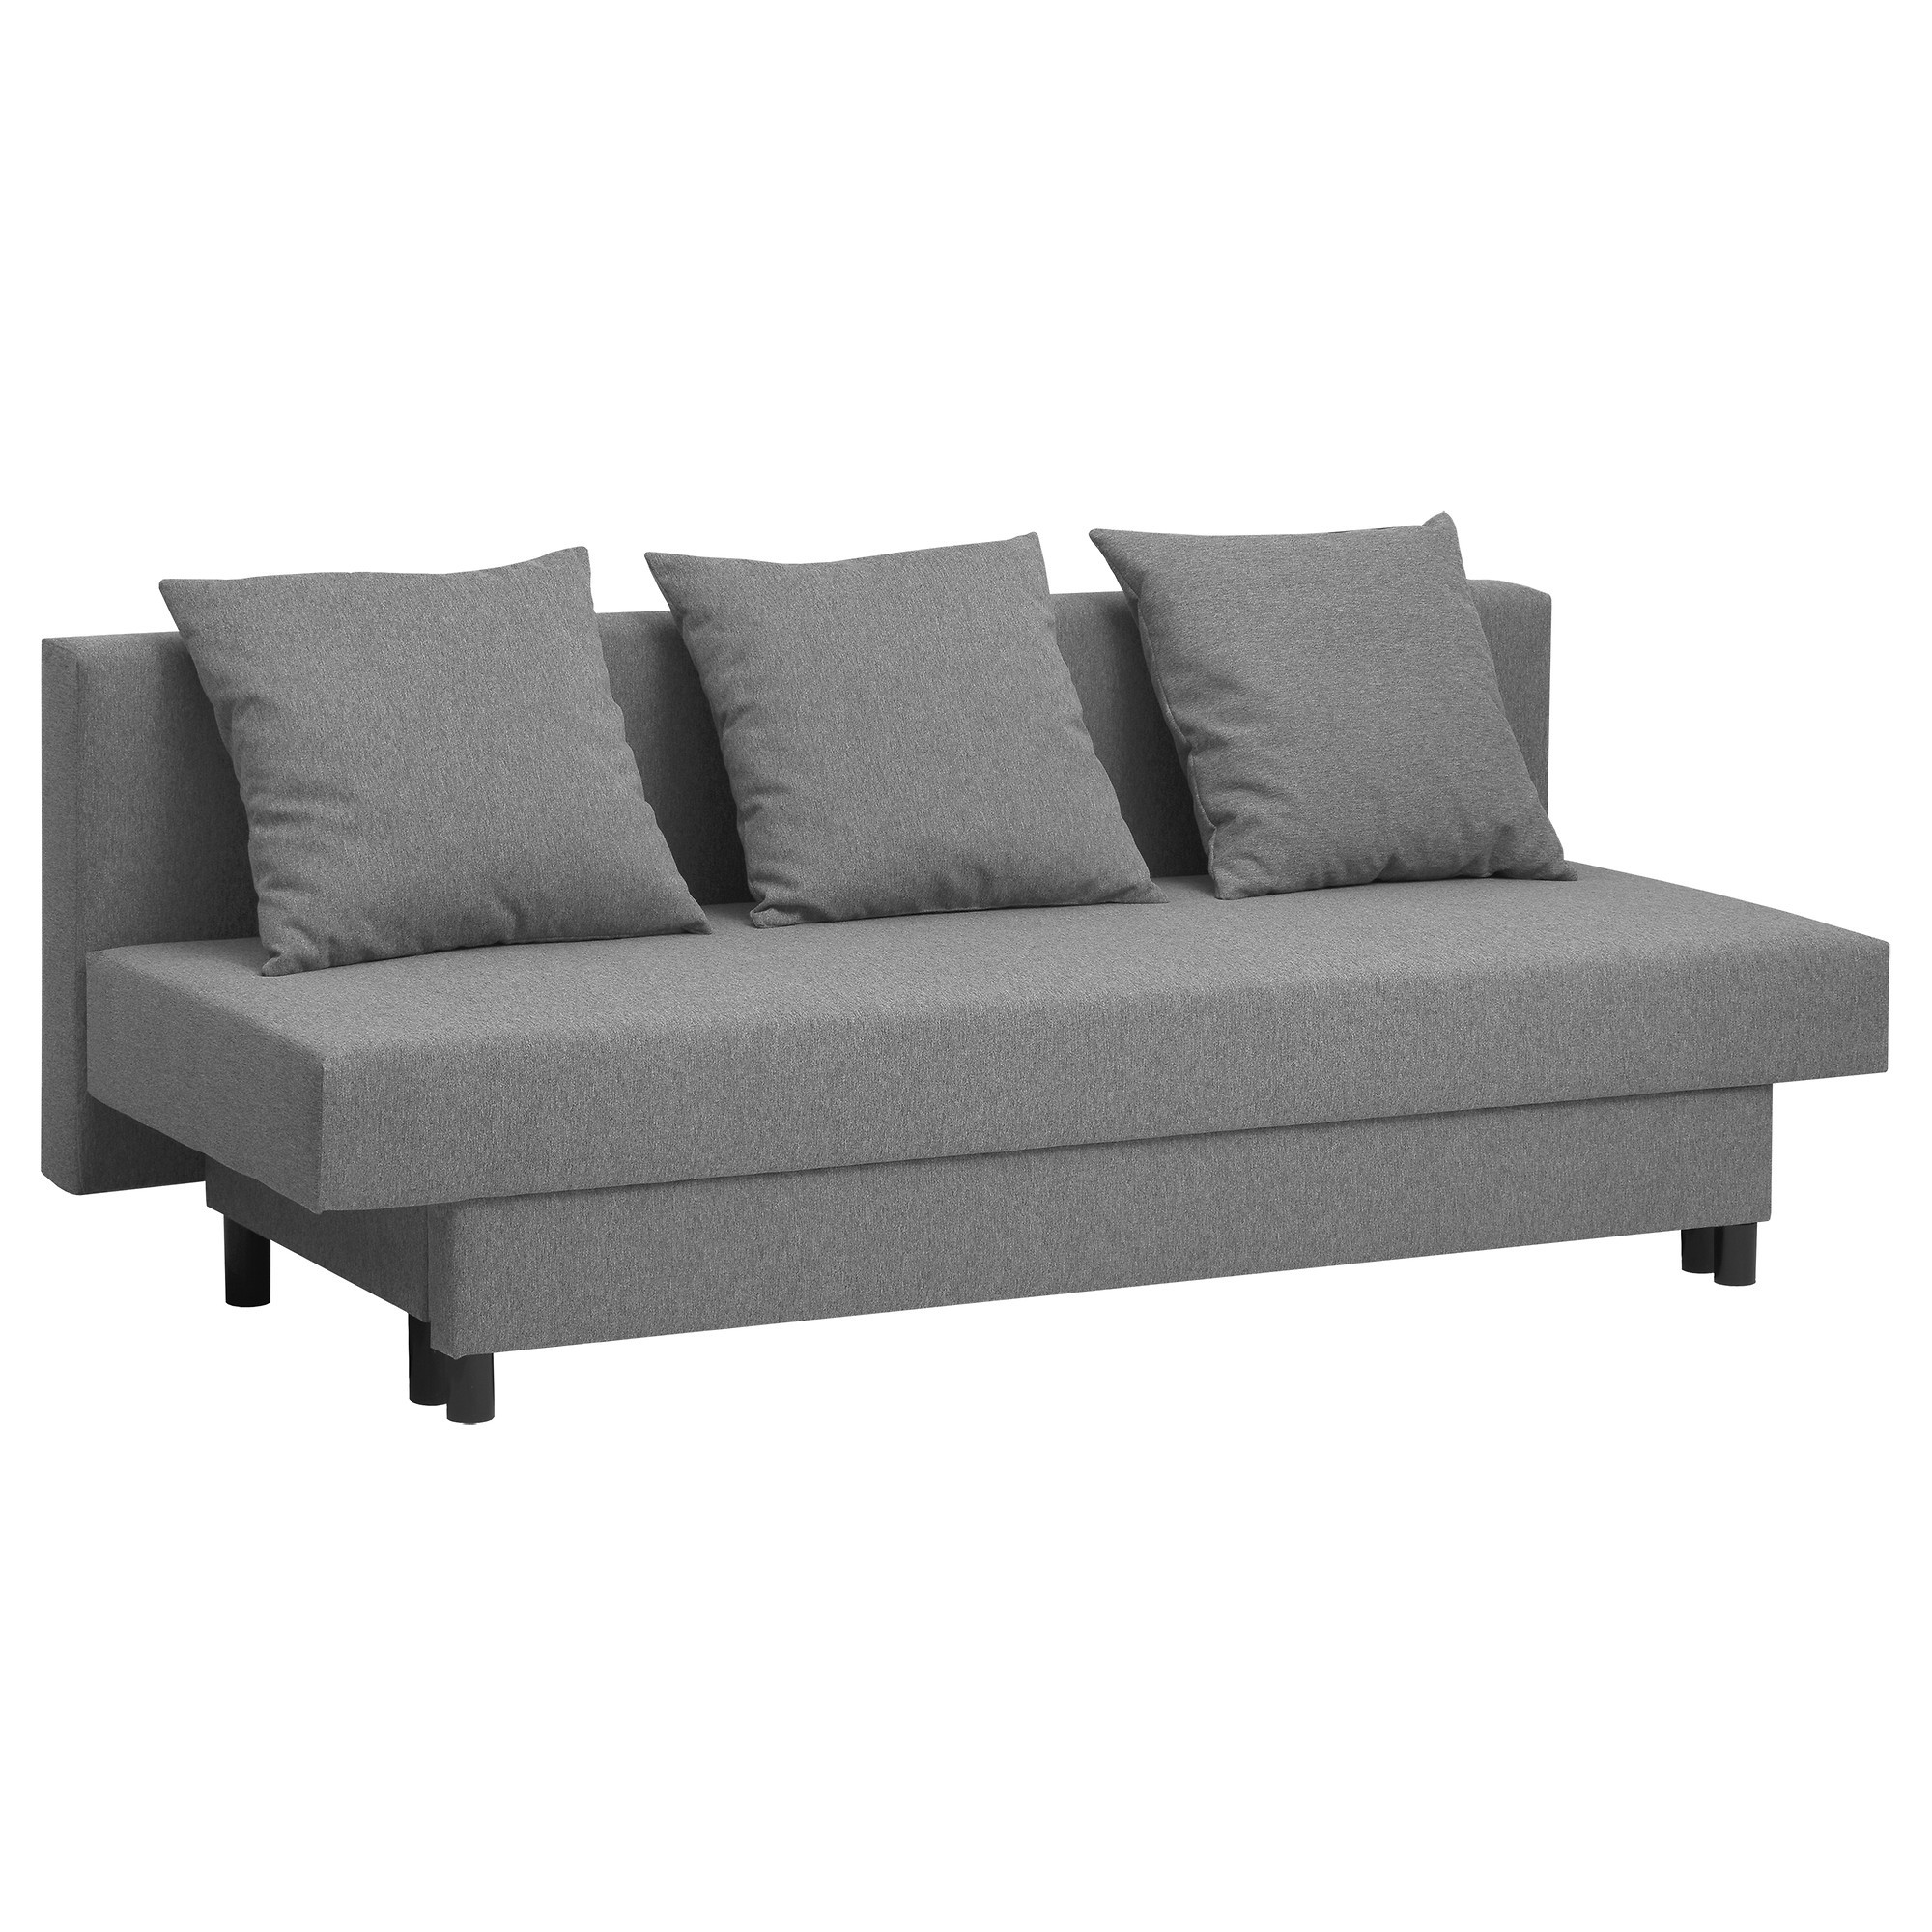 Canapé D'angle Clic Clac Ikea